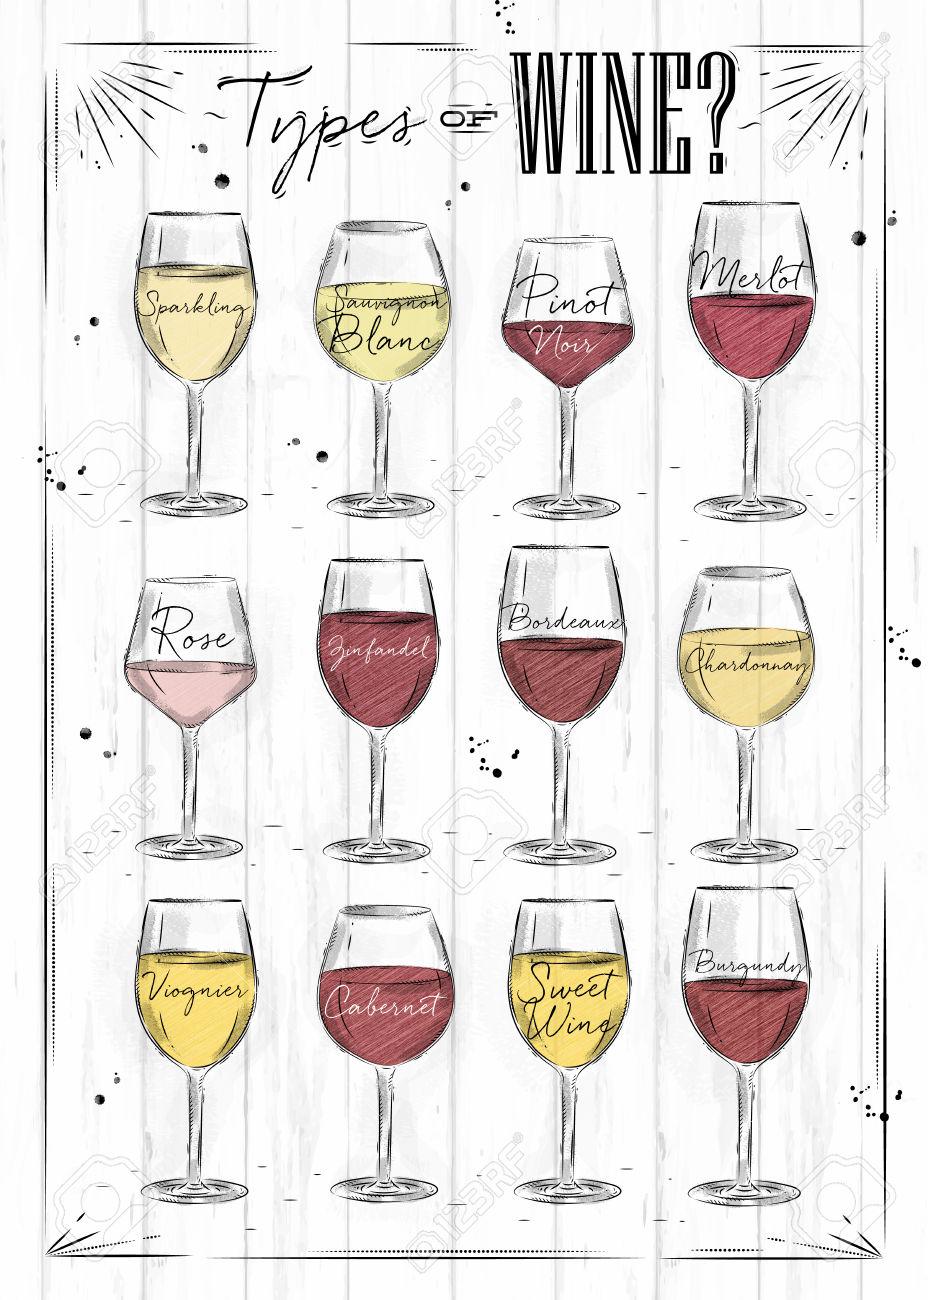 Poster Main Types Of Wine Sparkling, Sauvignon Blanc, Pinot Noir.